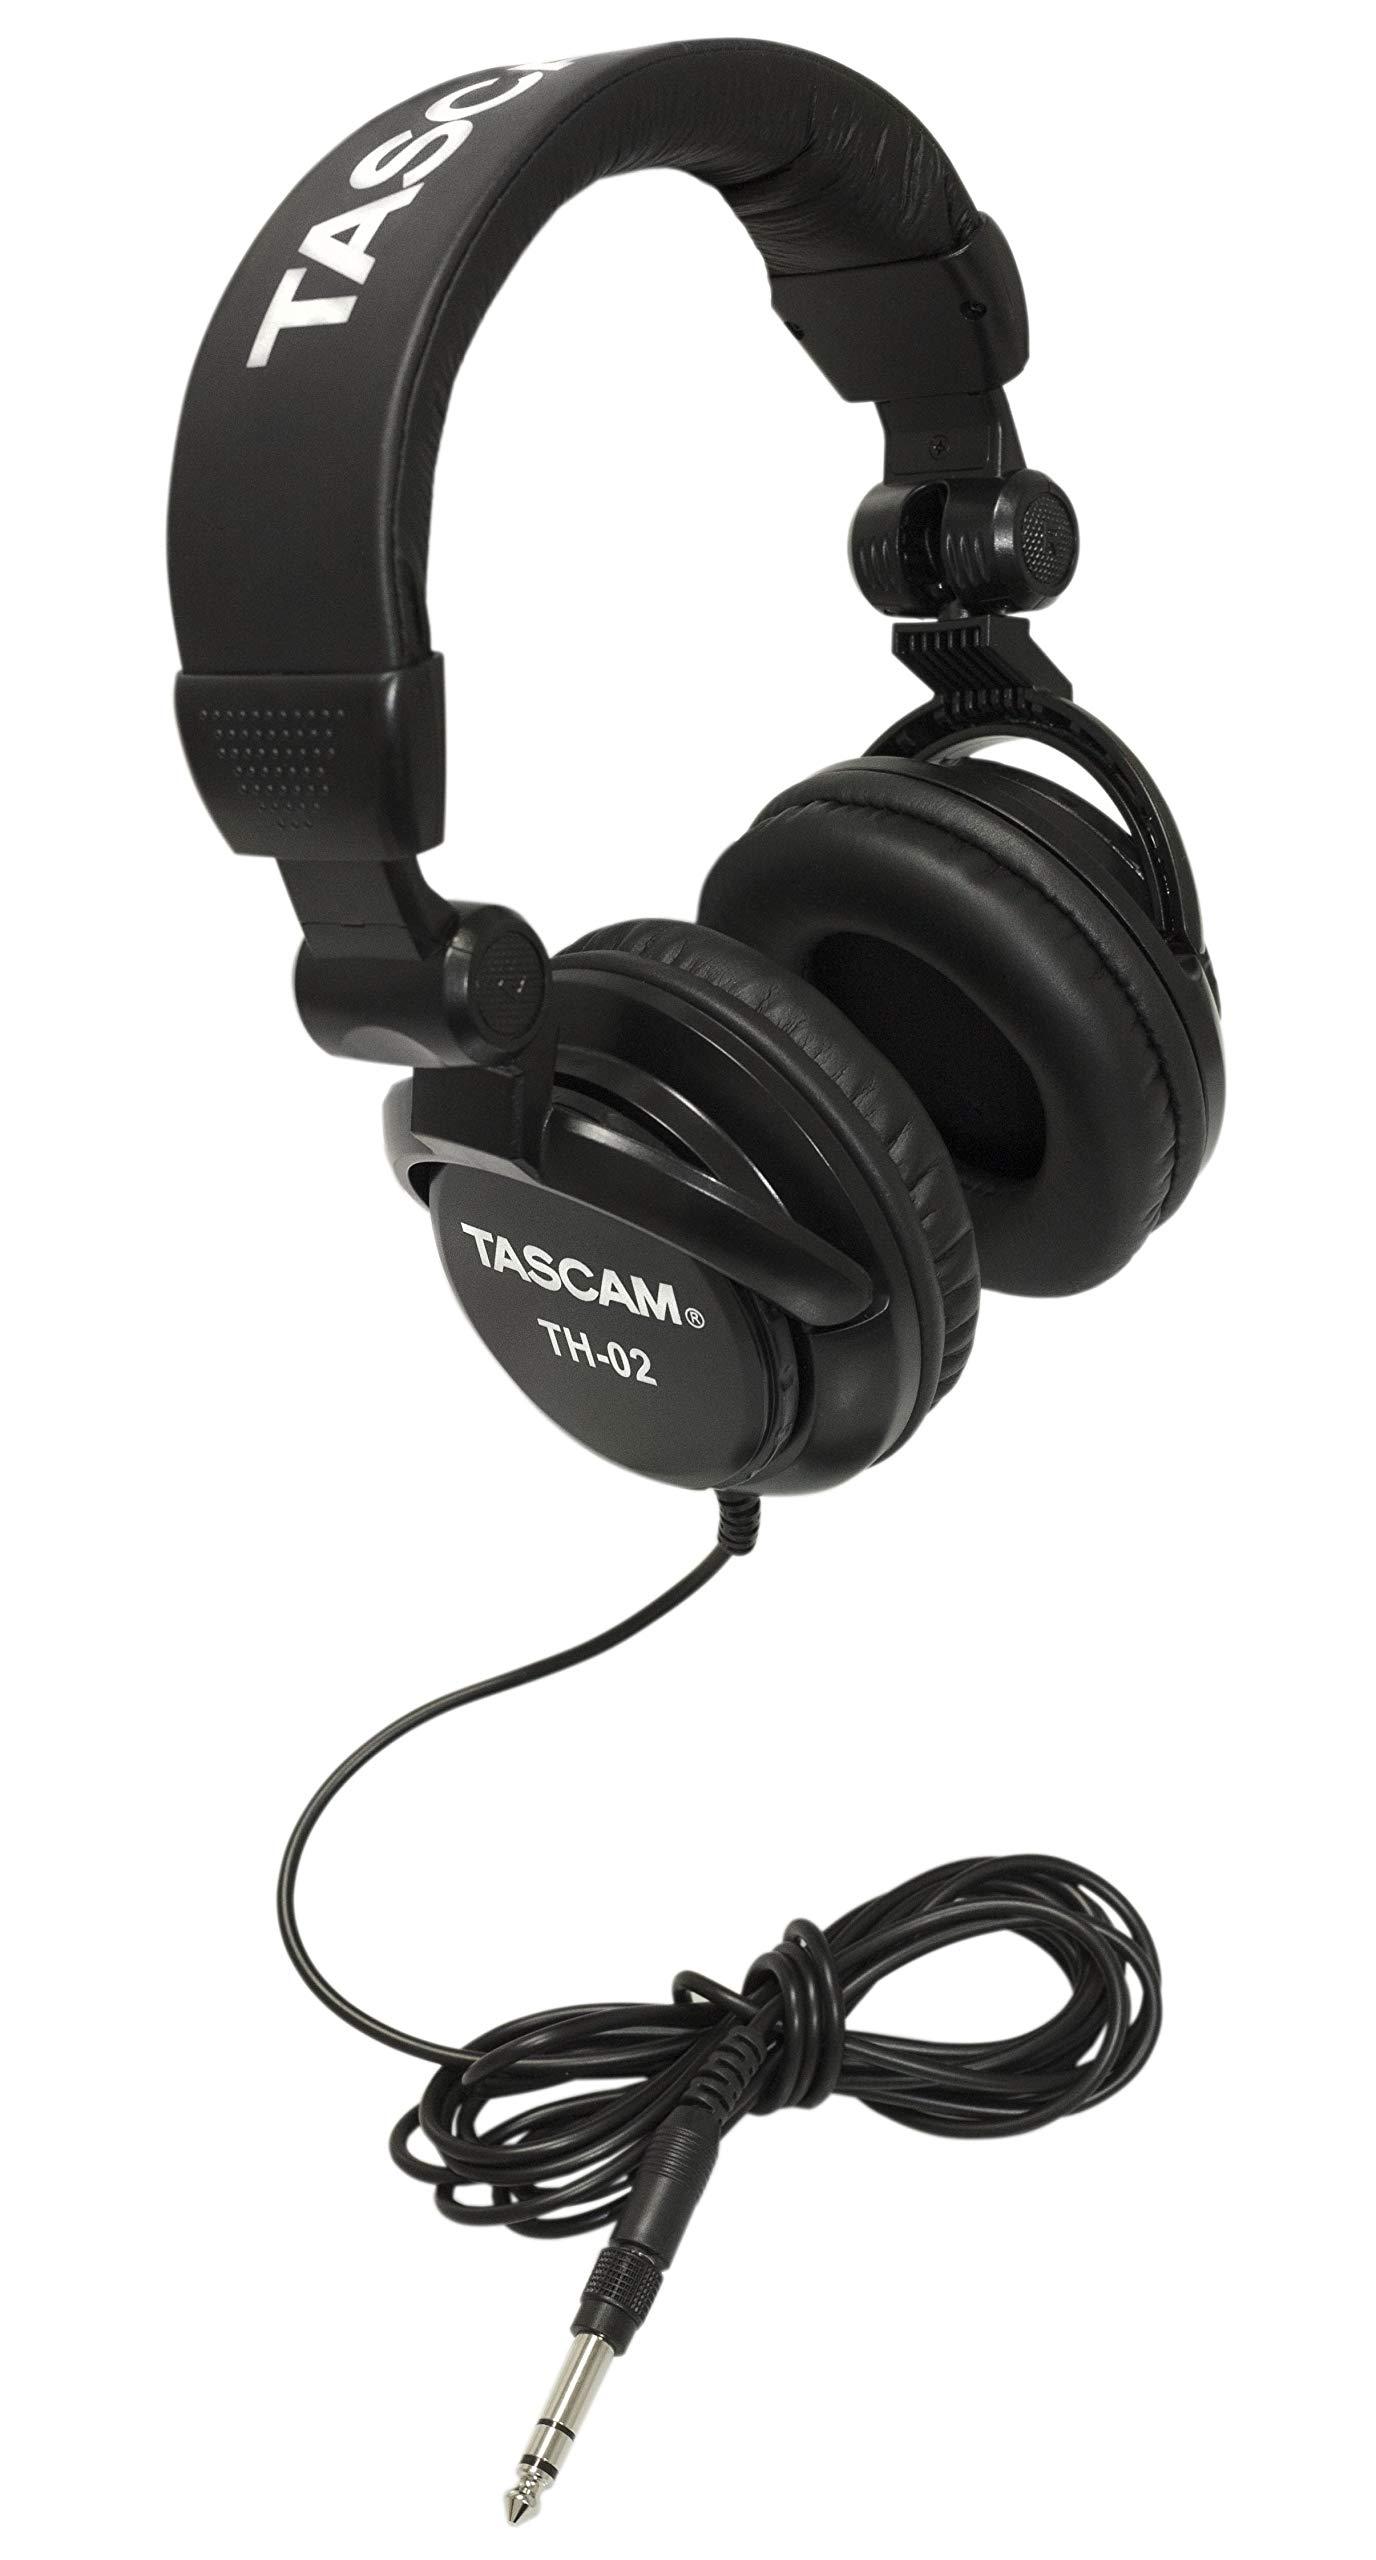 Tascam Th-02 Auriculares Cerrados De Estudio Negros (06po)